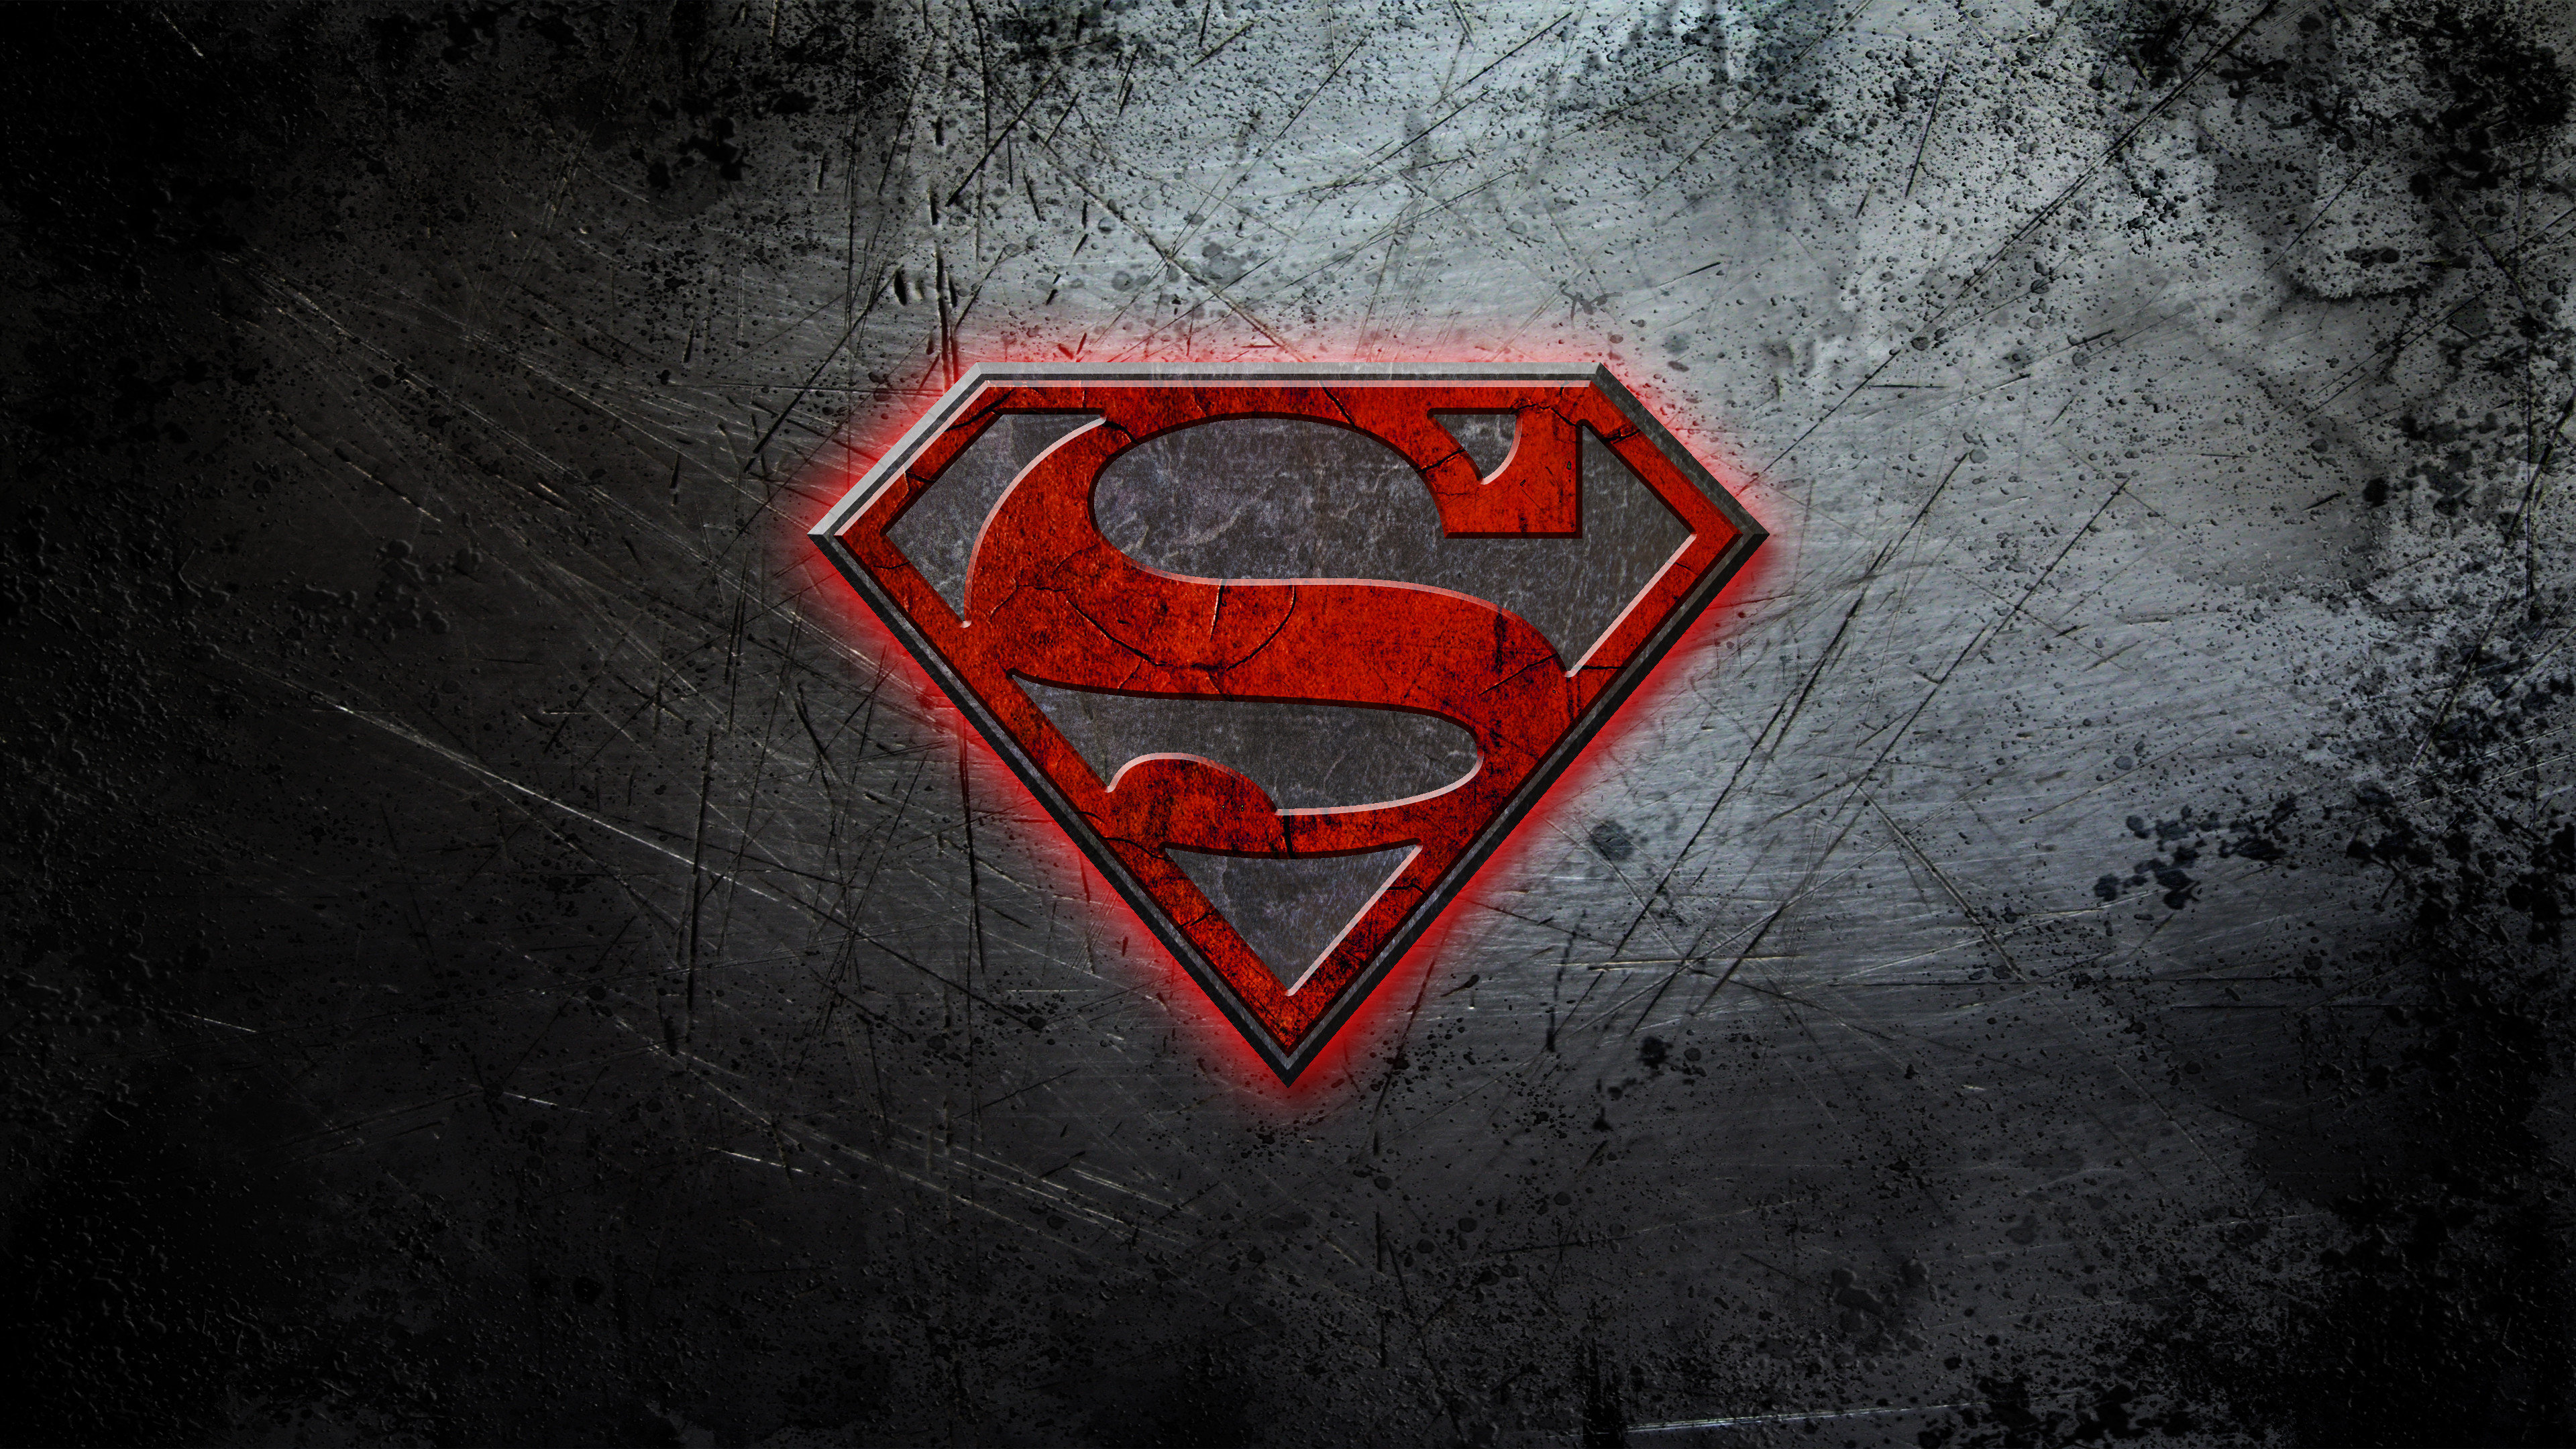 Superman Logo 4K Ultra HD Wallpaper [3840x2160]